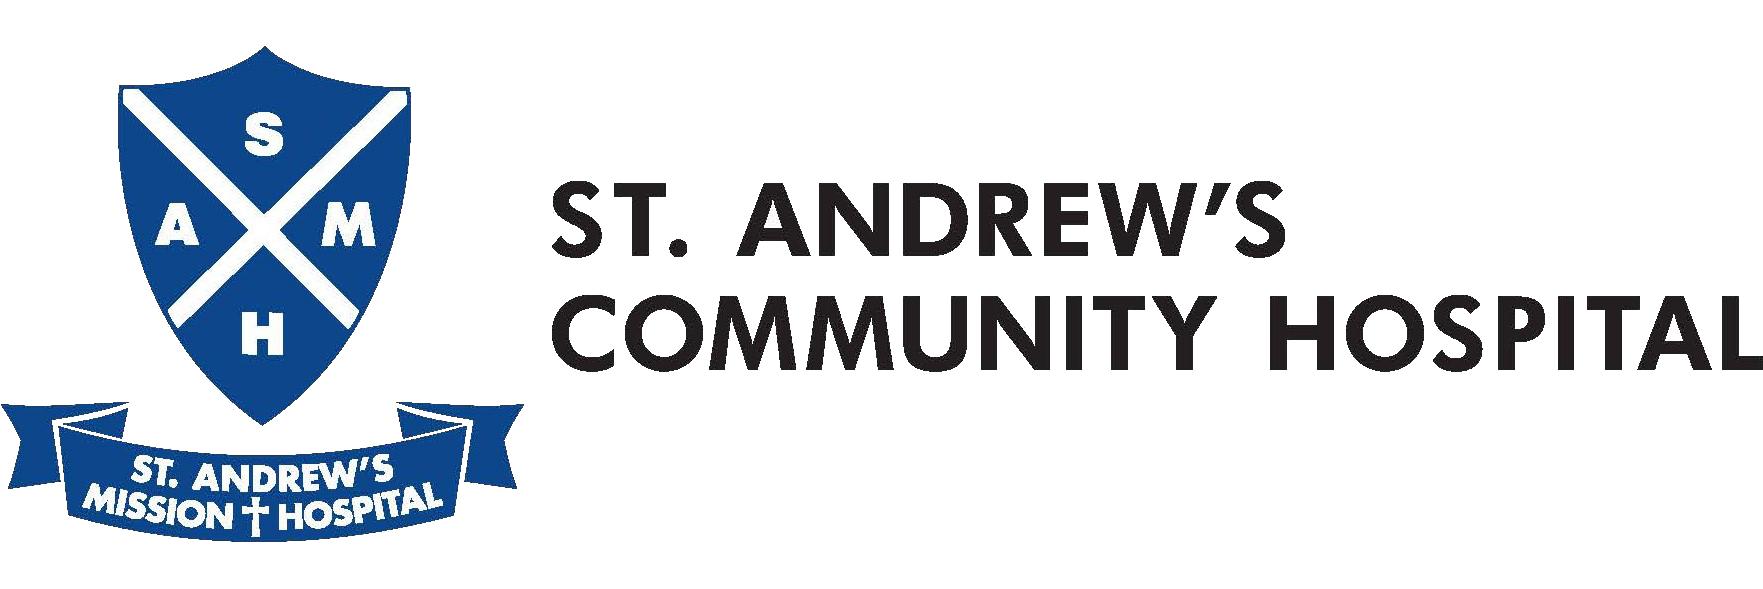 Home - St Andrew's Community Hospital